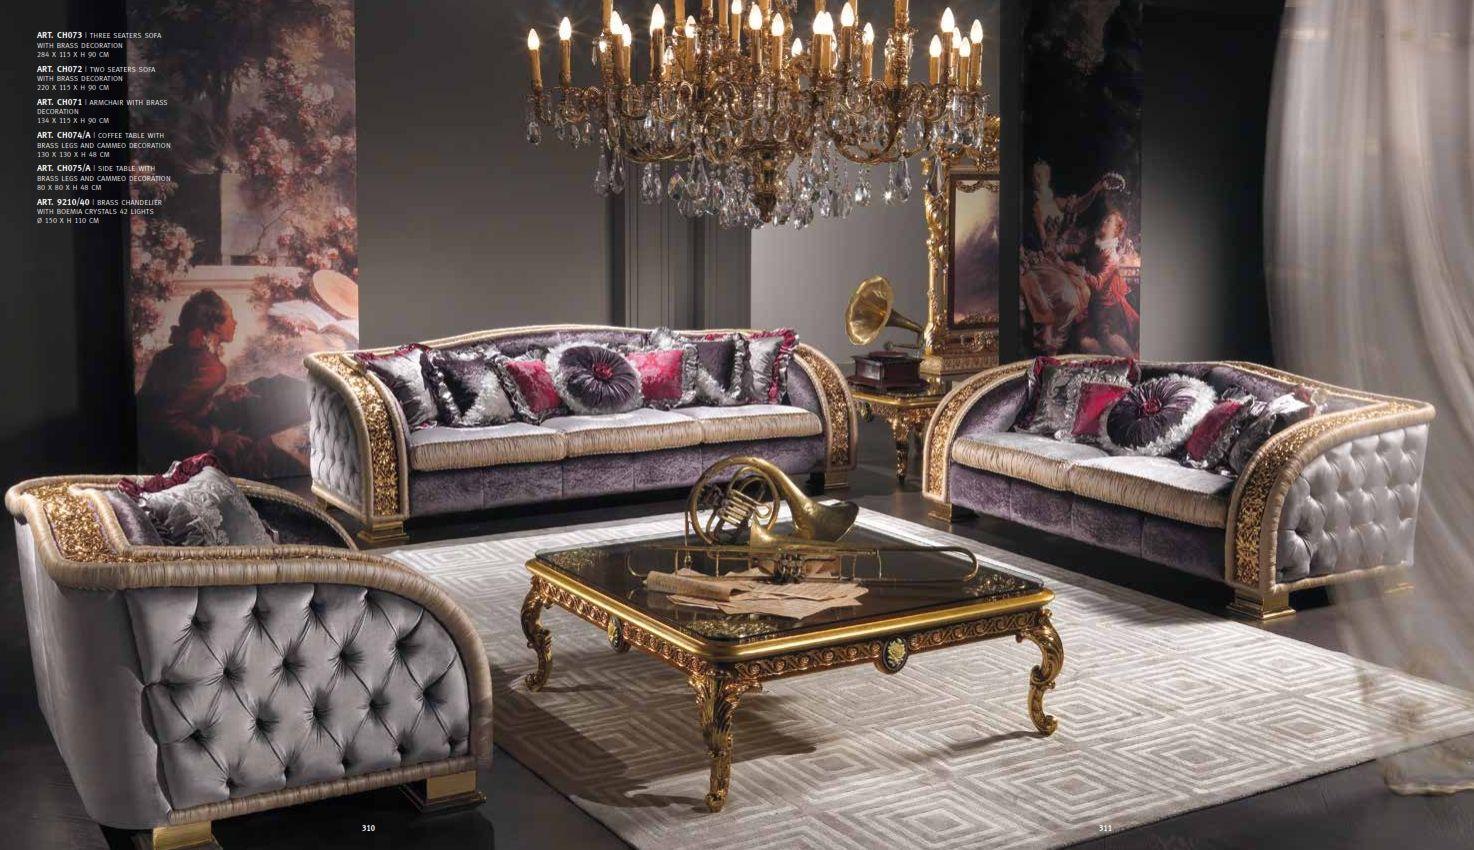 luxus m bel luxuri se sofas cappelletti serie charmedie m bel aus italien. Black Bedroom Furniture Sets. Home Design Ideas